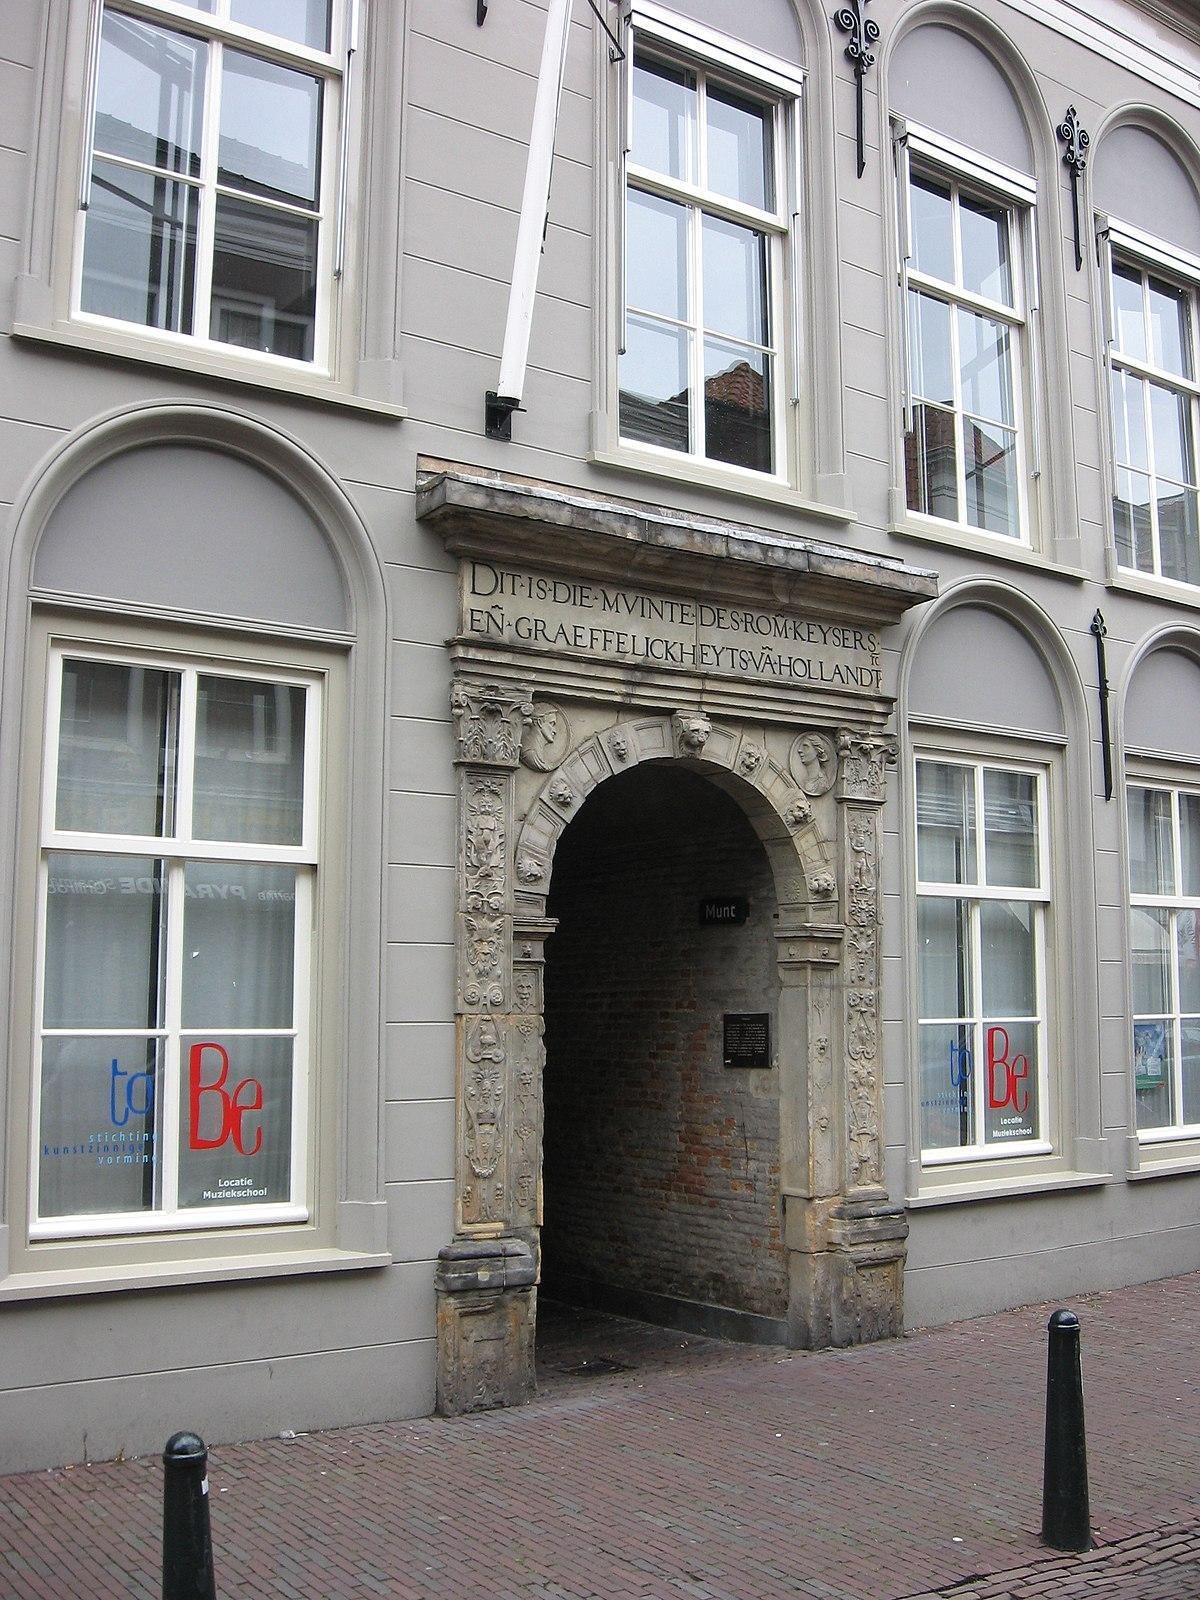 Munt van holland wikipedia for Amsterdam poort